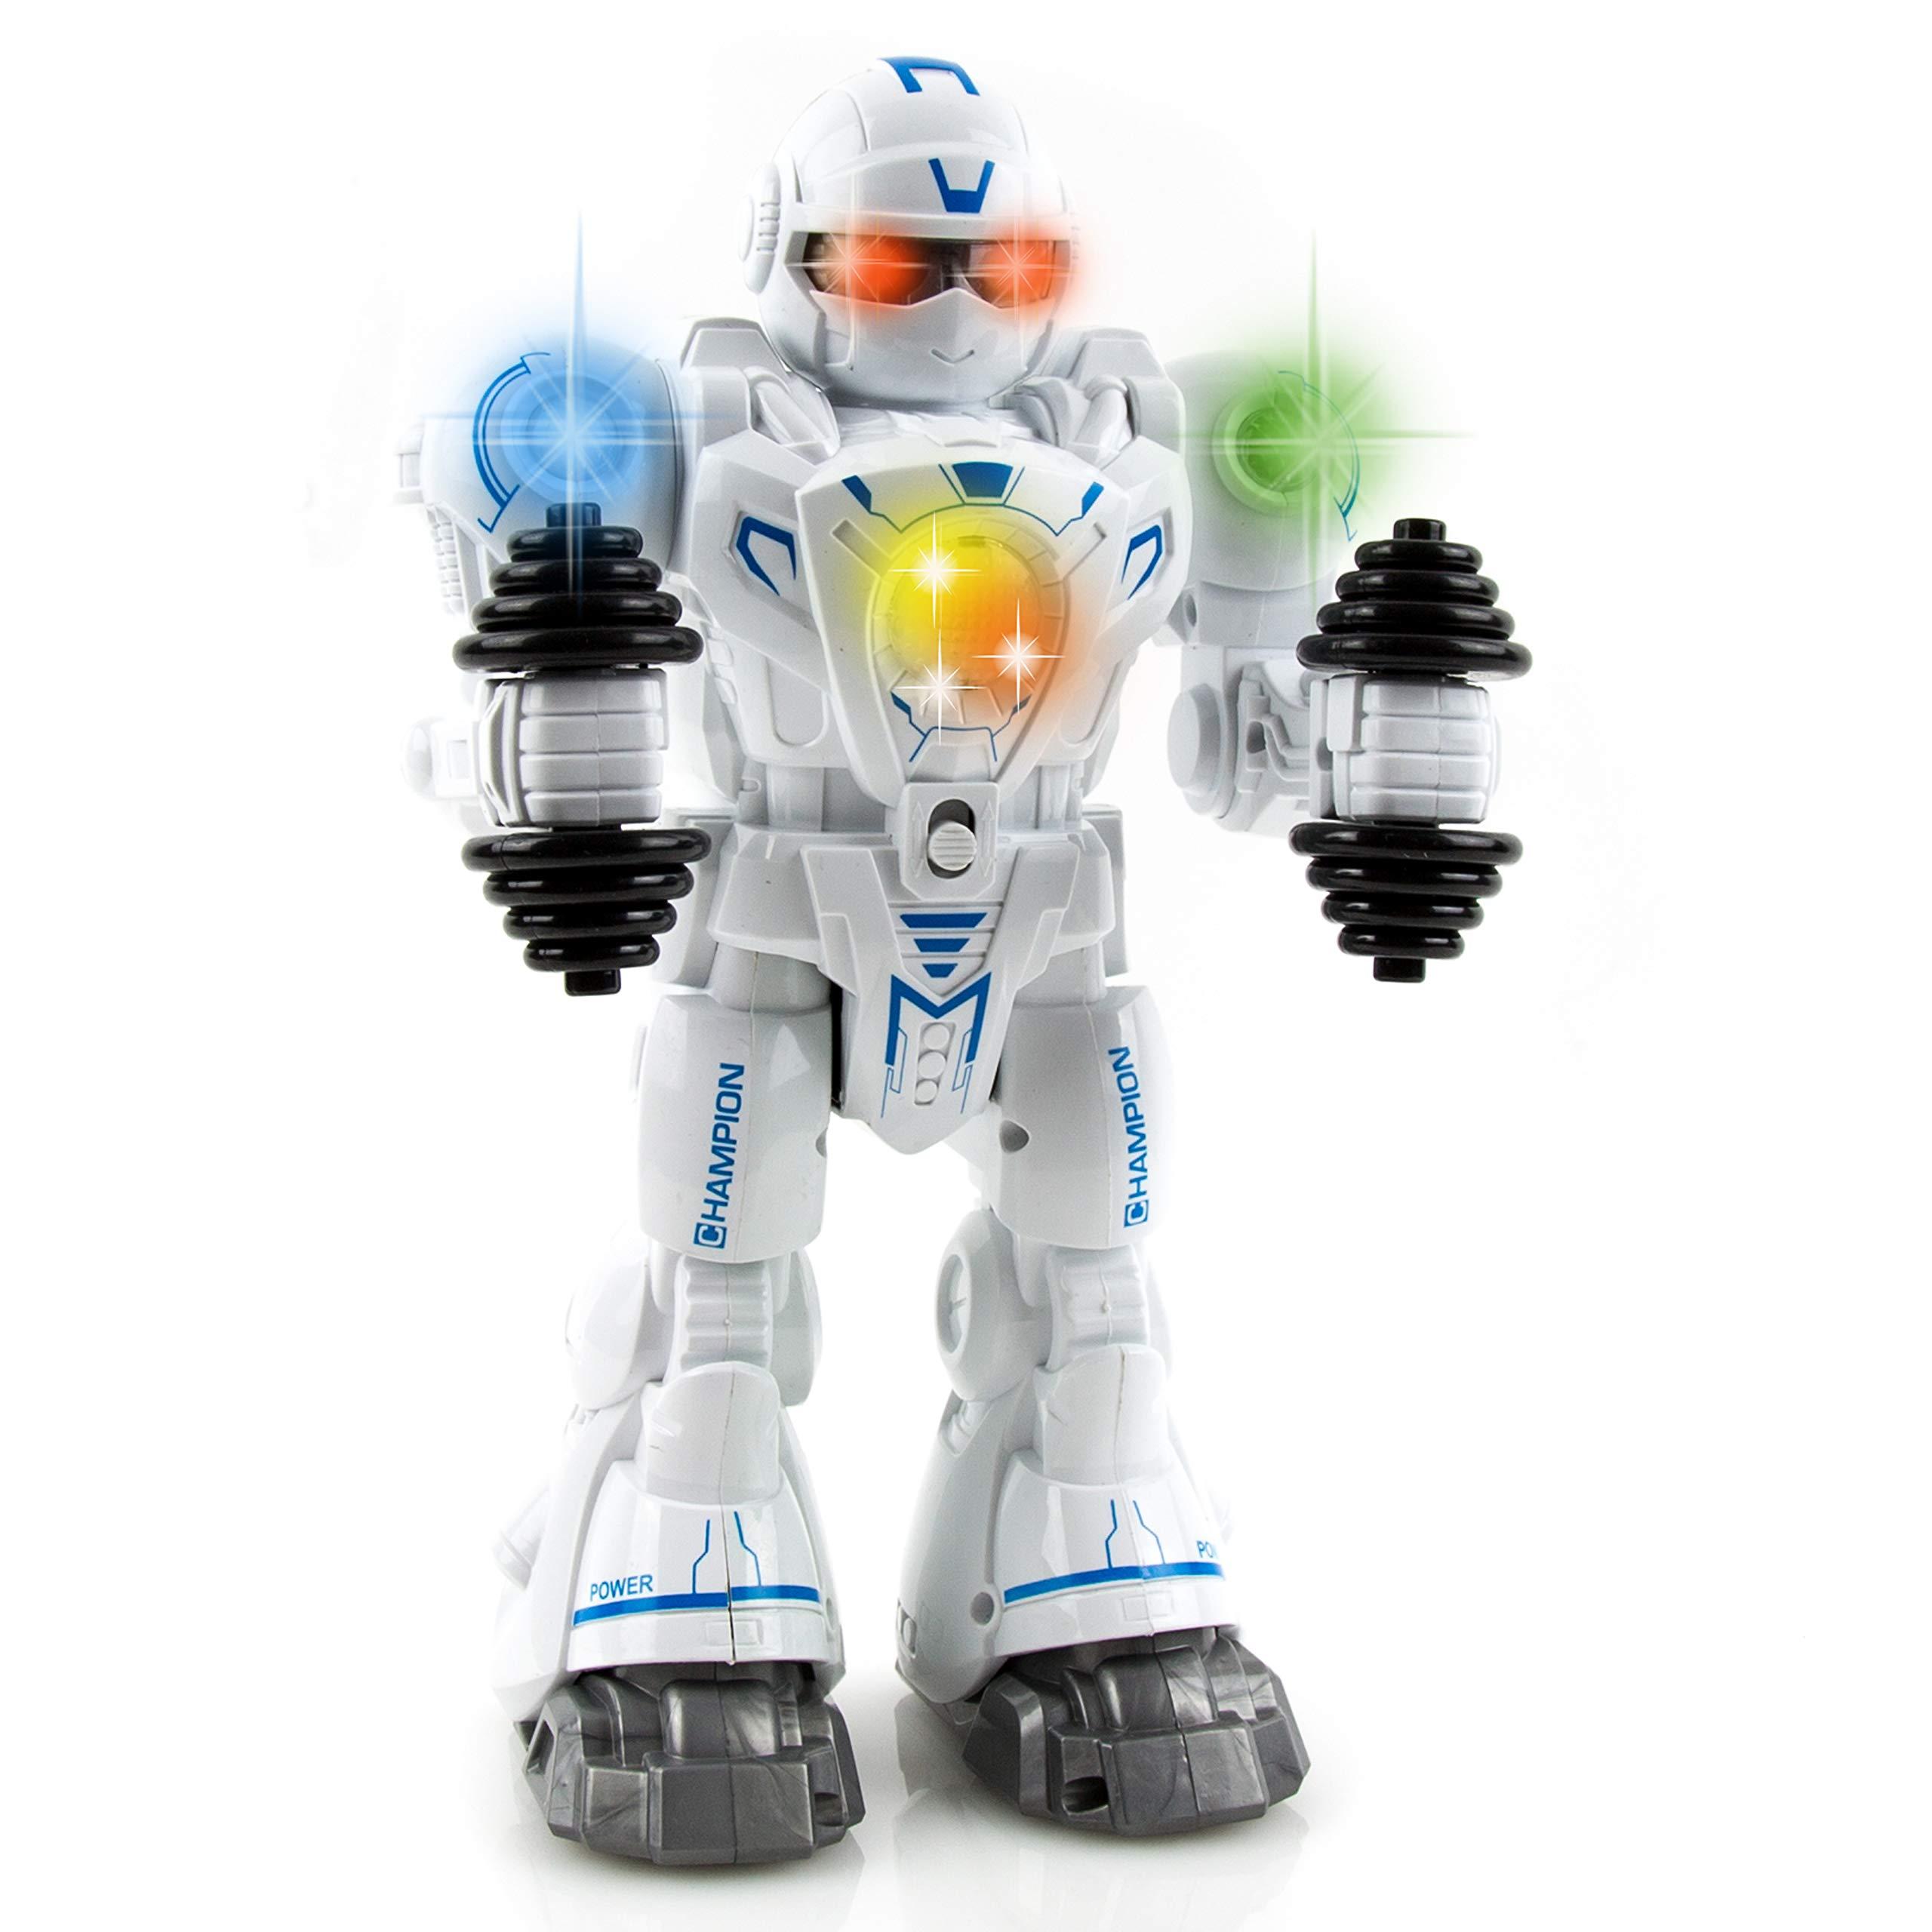 Toysery Walking Dancing Robot Toy Kids - Interactive Walking, Dancing Smart Robot Kit Boys & Girls (Battery Operated)